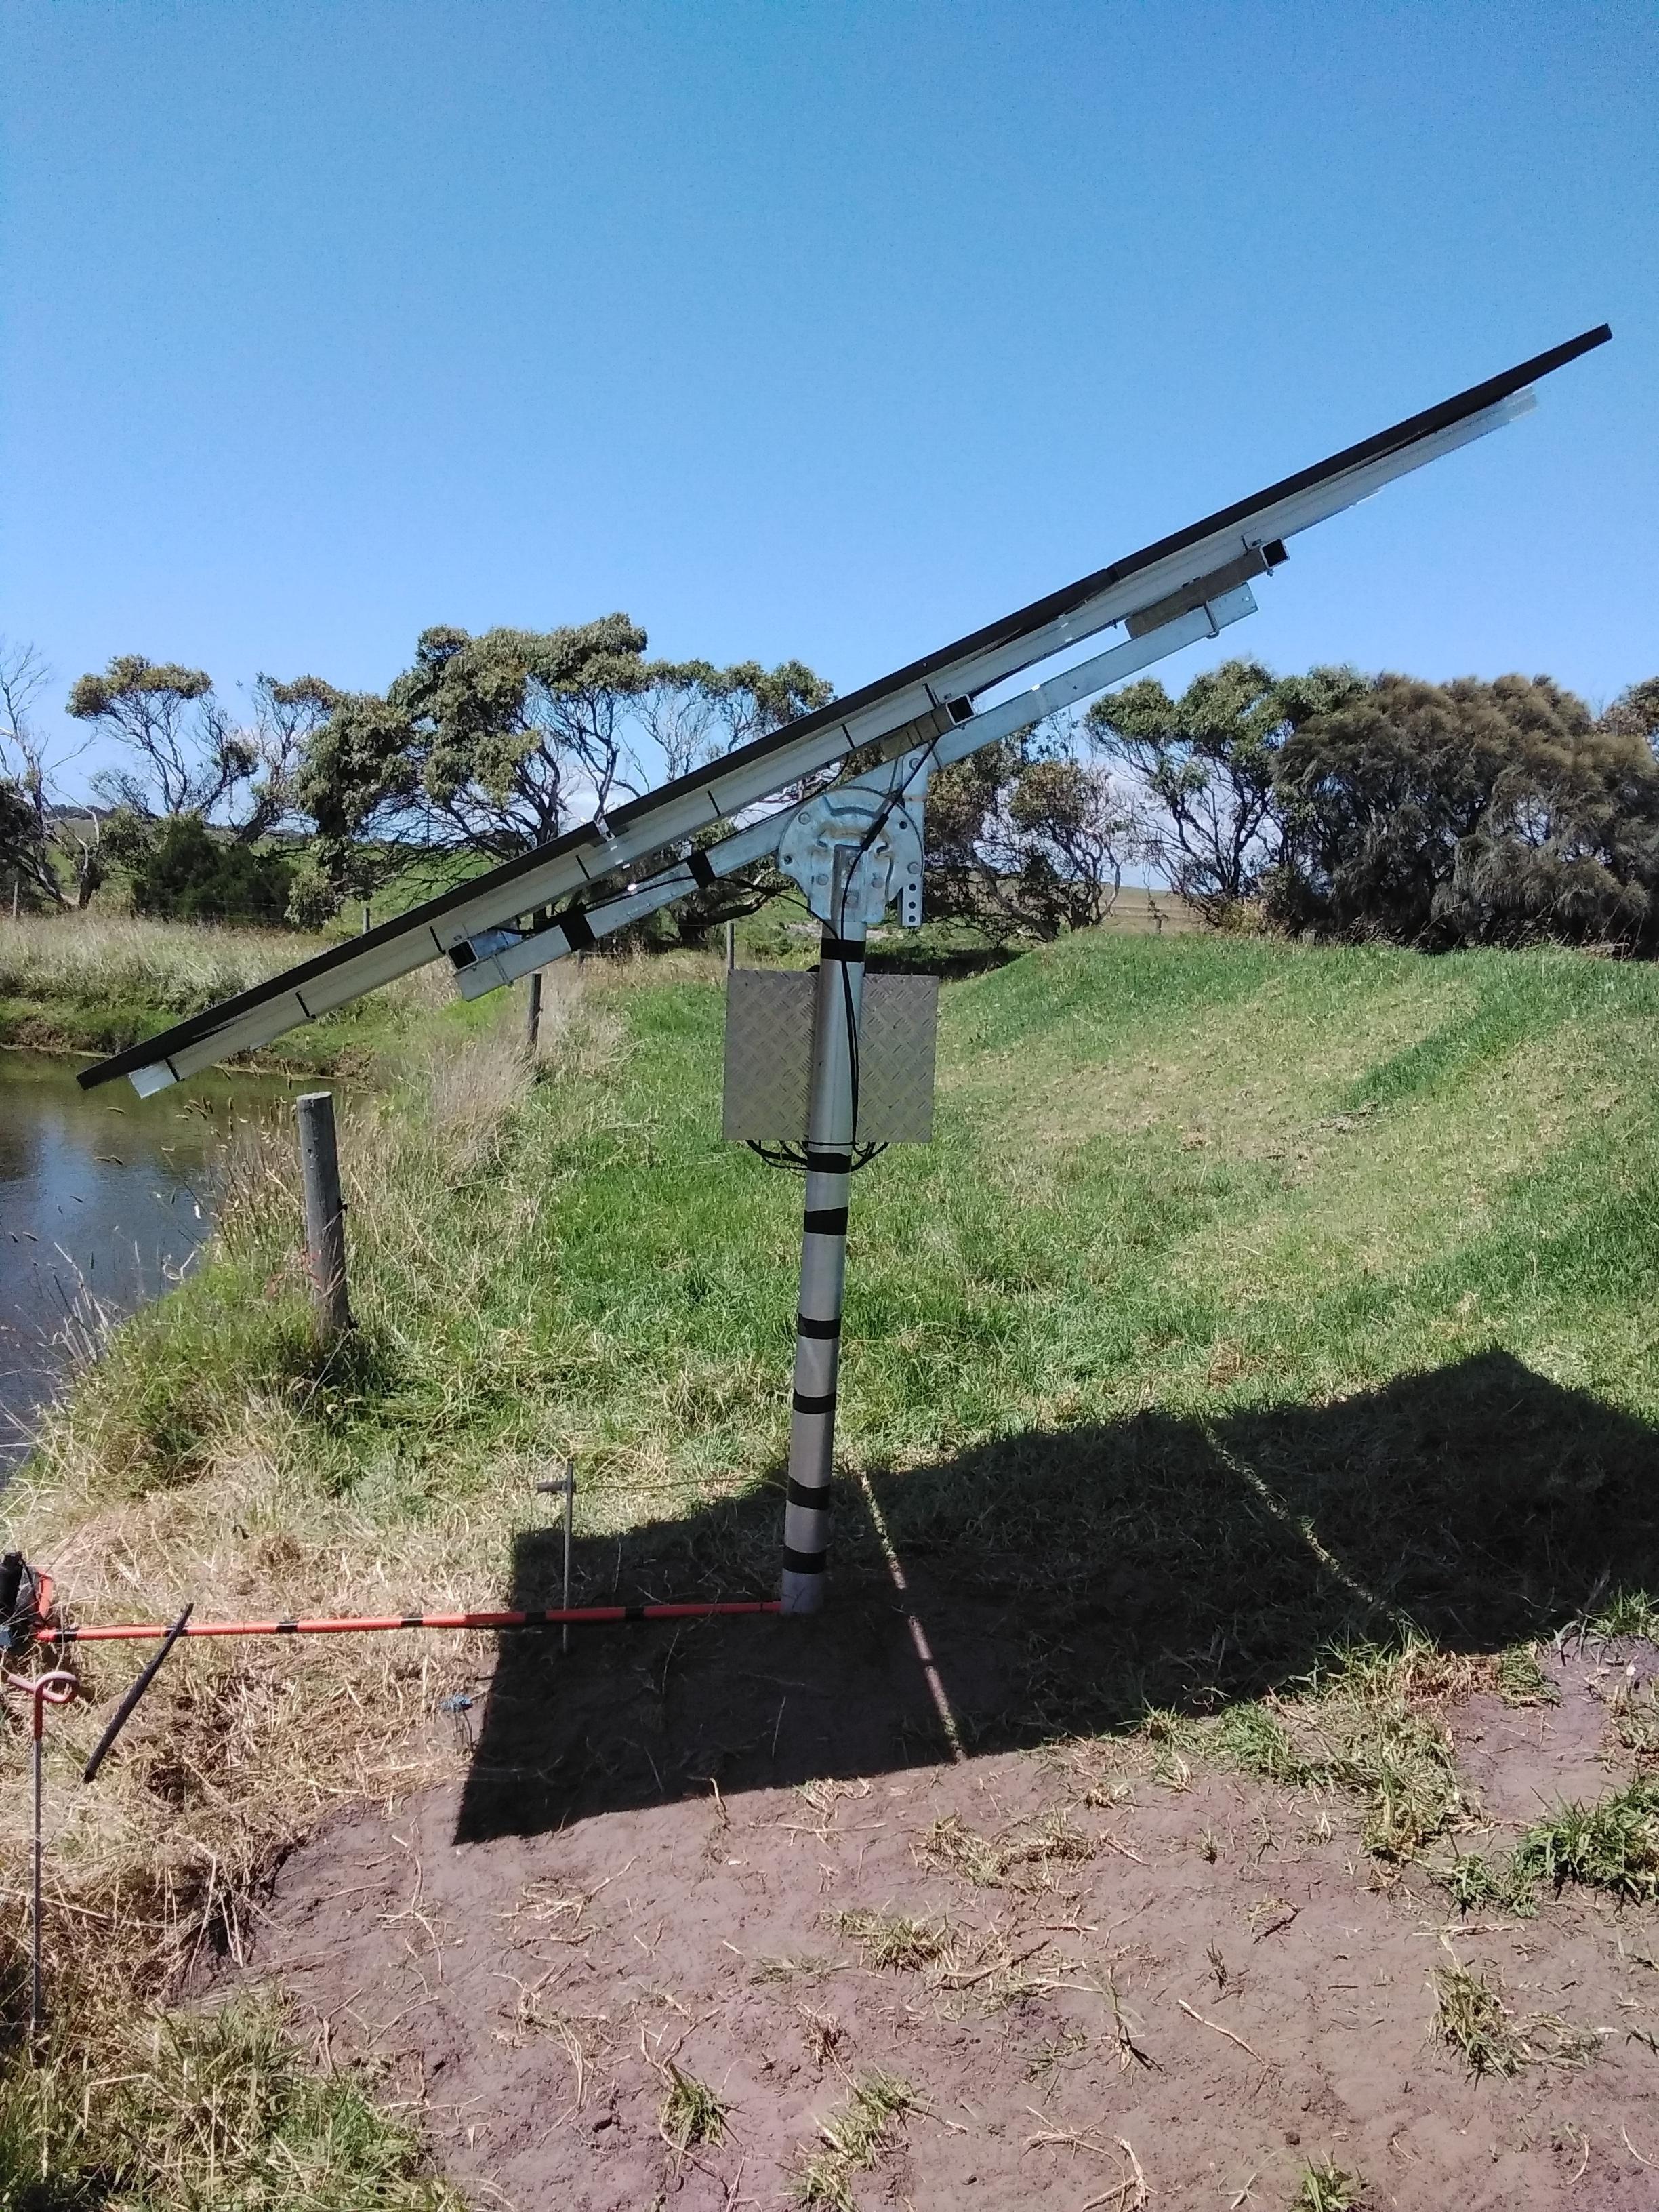 Millar Rd Yanakie, Australia, February 2021